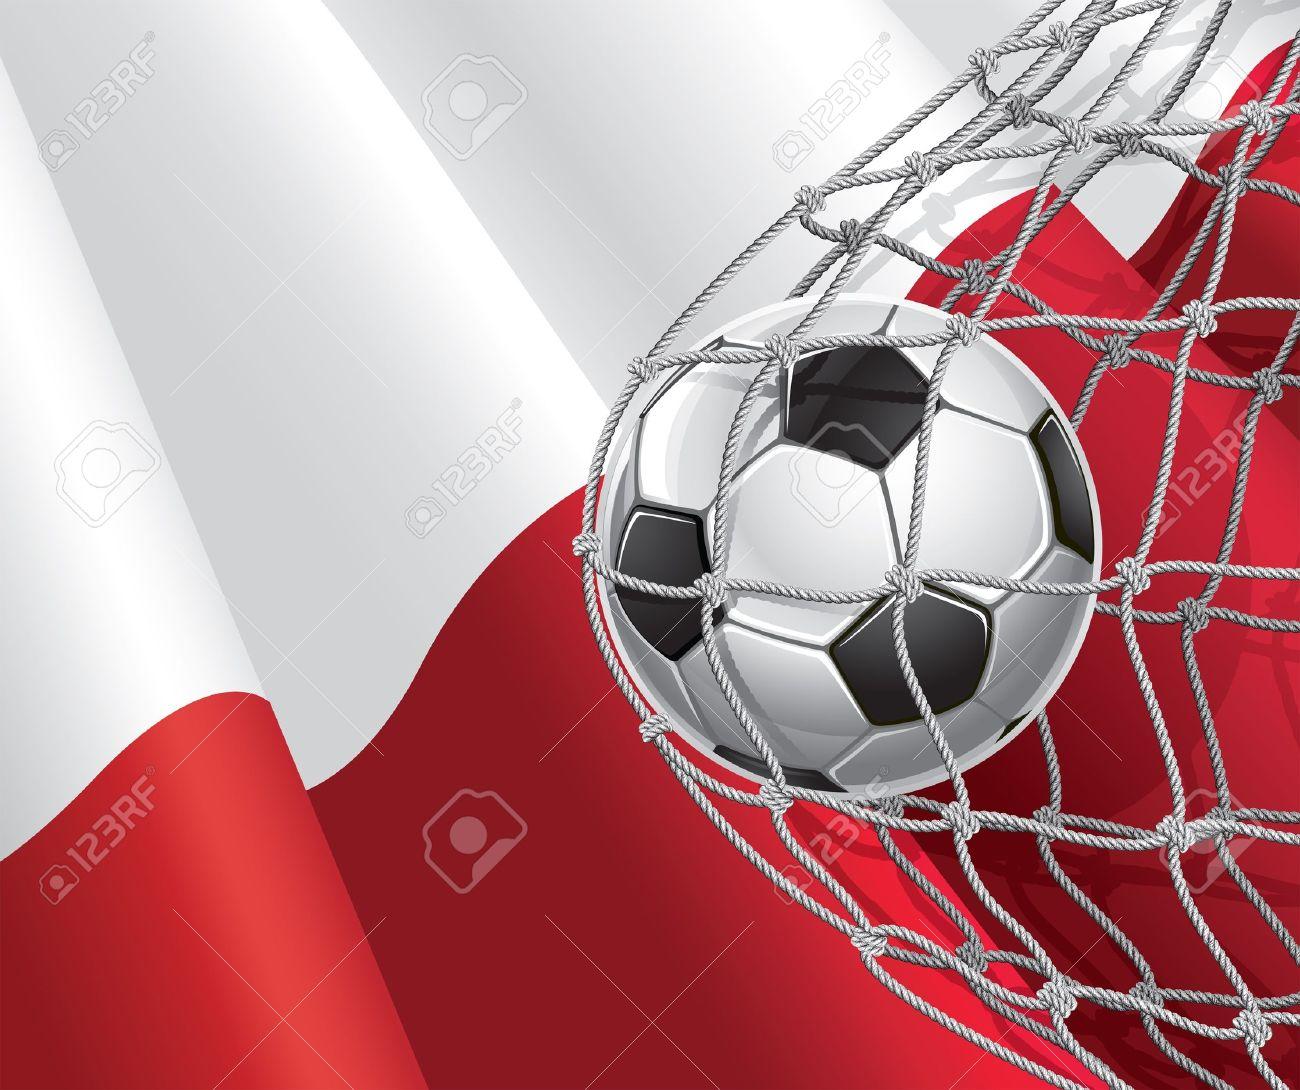 soccer goal polish flag with a soccer ball in a net illustration